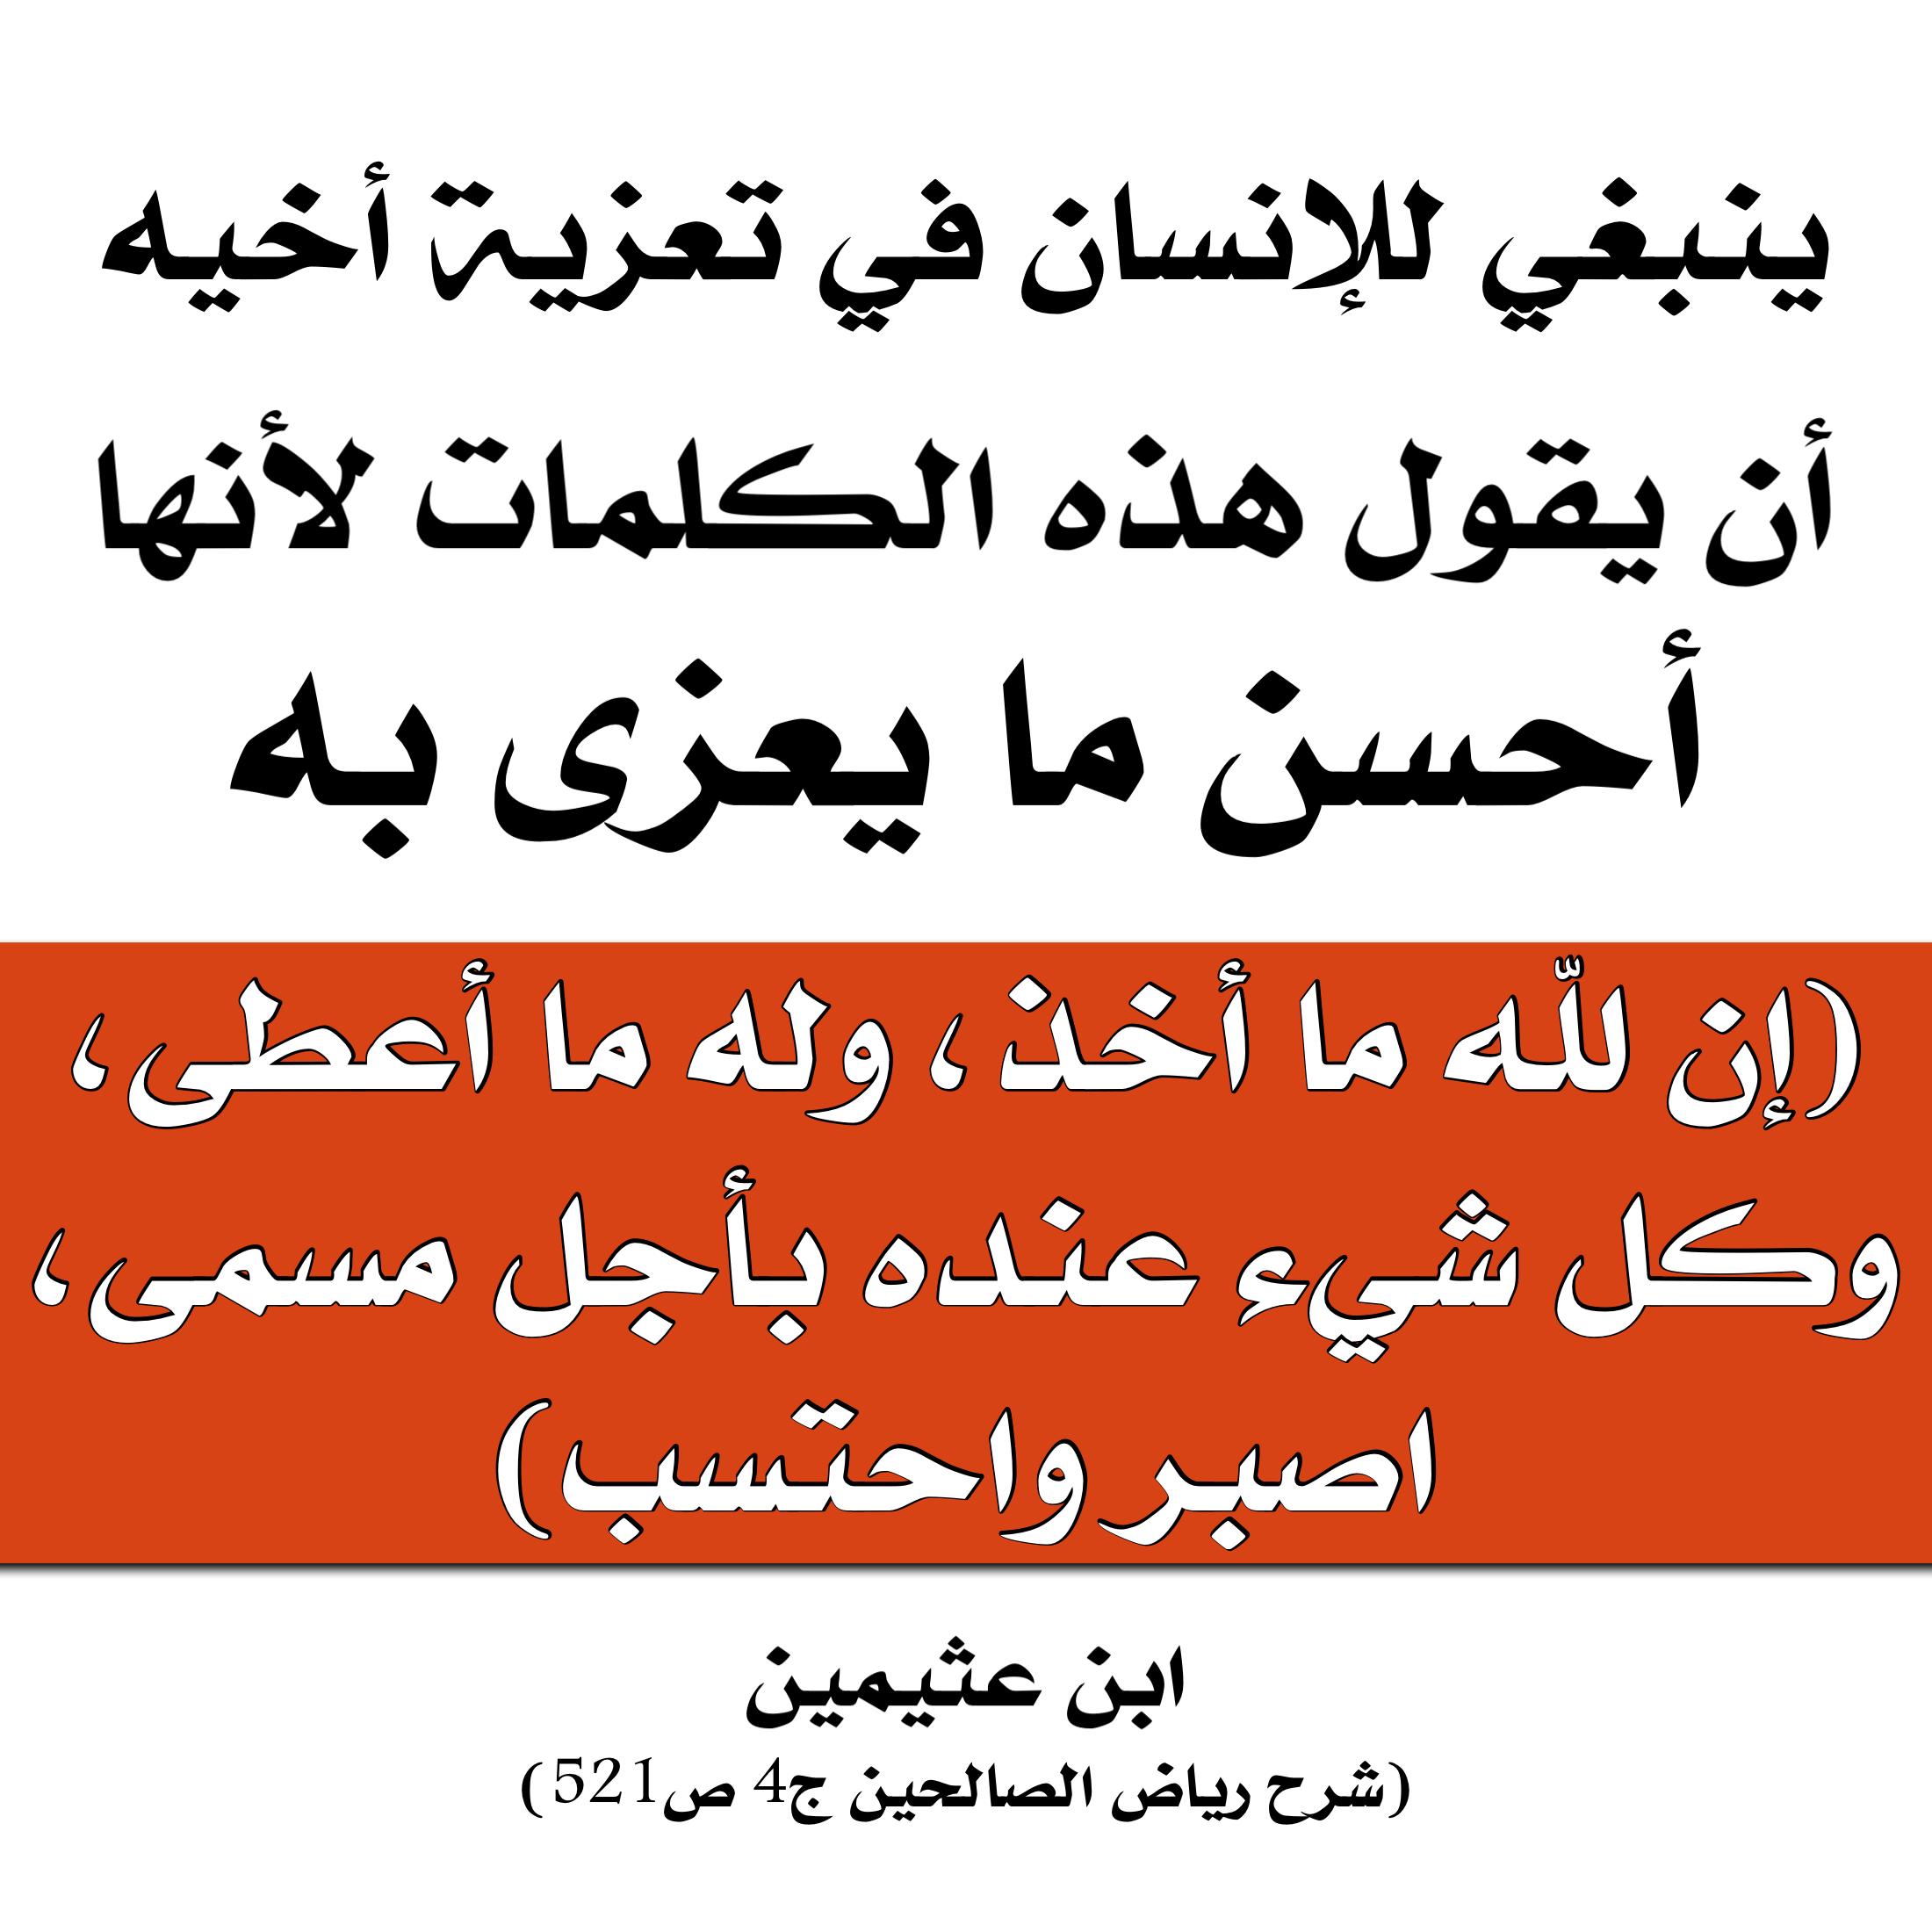 Pin By Wallaa Abbas On أقوال الصحابة والعلماء Marshmallow Fondant Fondant Figures Tutorial Fondant Flower Cake